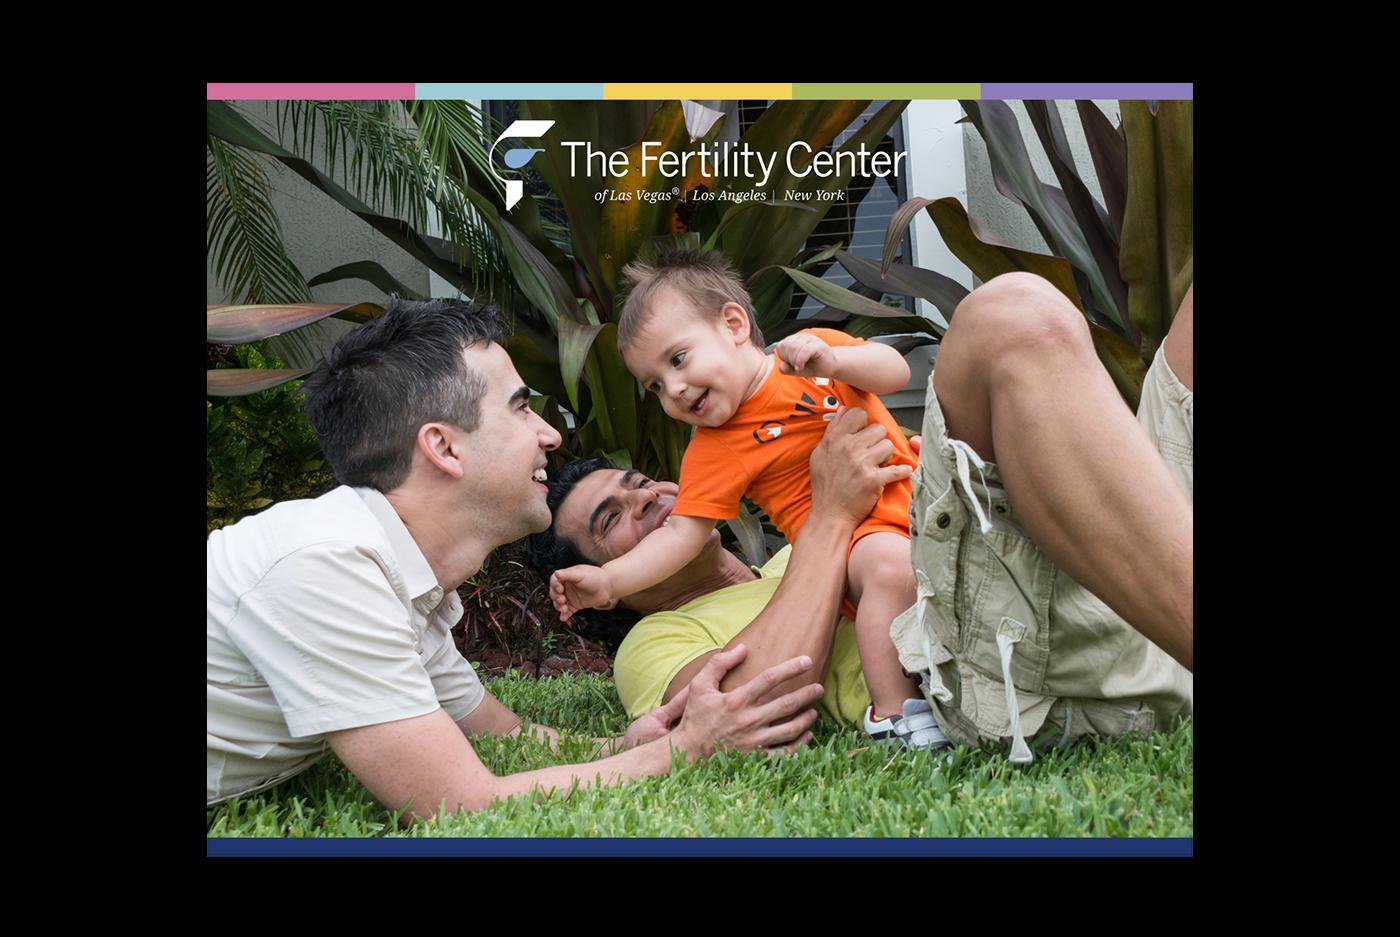 Andre Luis Santos graphic design  Fertility Center medical design Las Vegas Trade Show booth